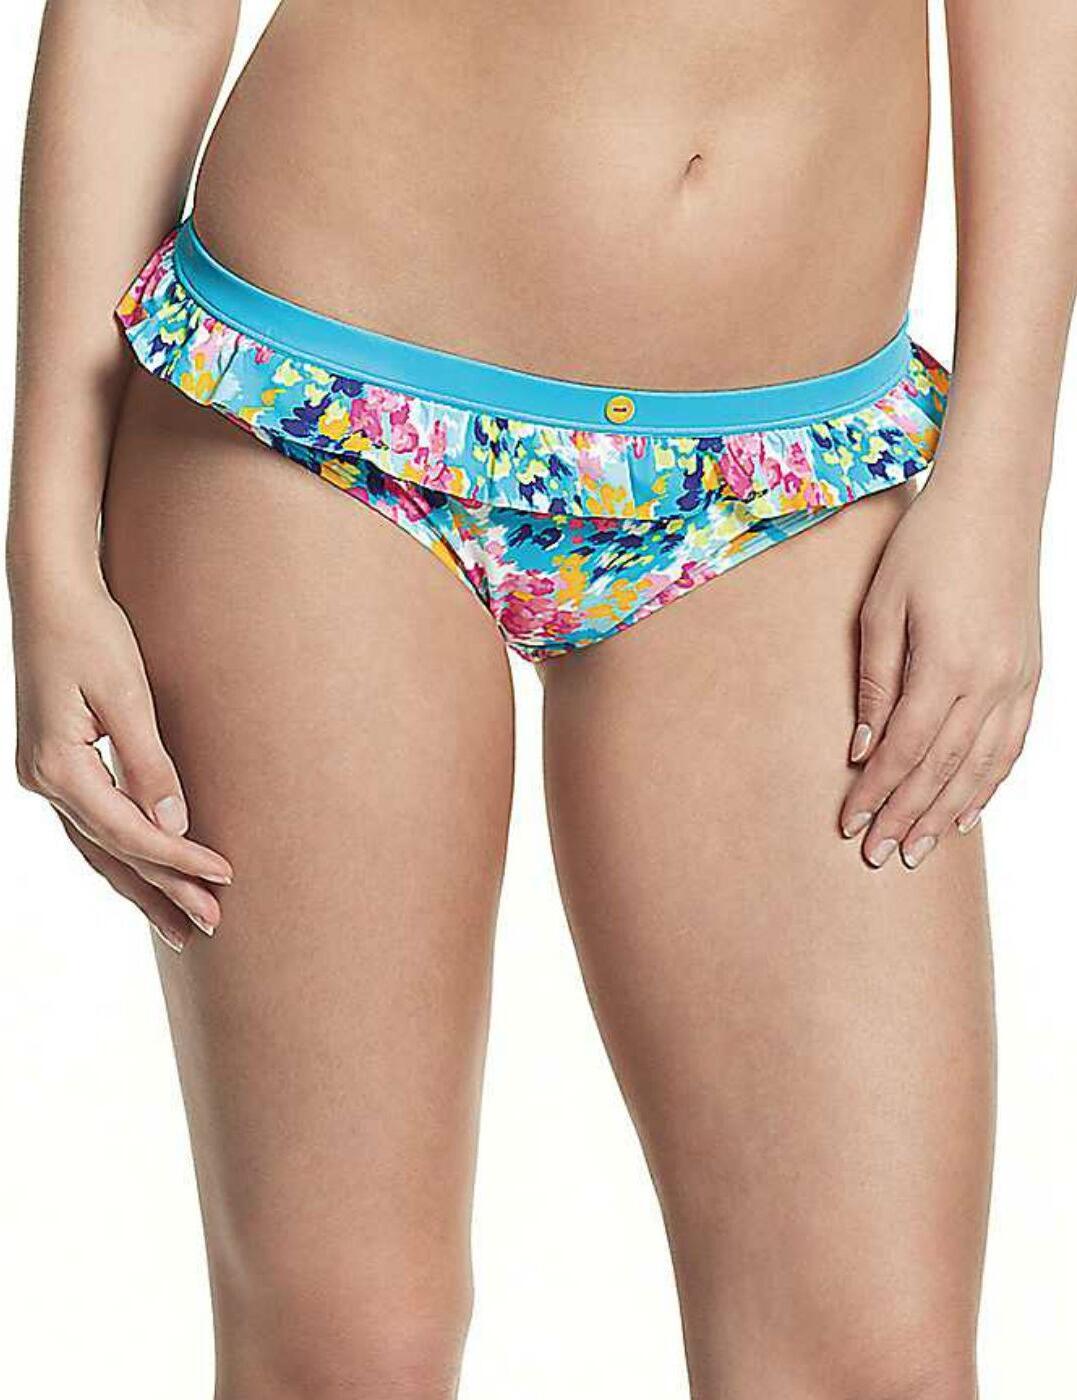 CW0099 Cleo Lulu Frill Bikini Pant - CW0099 Frill Brief